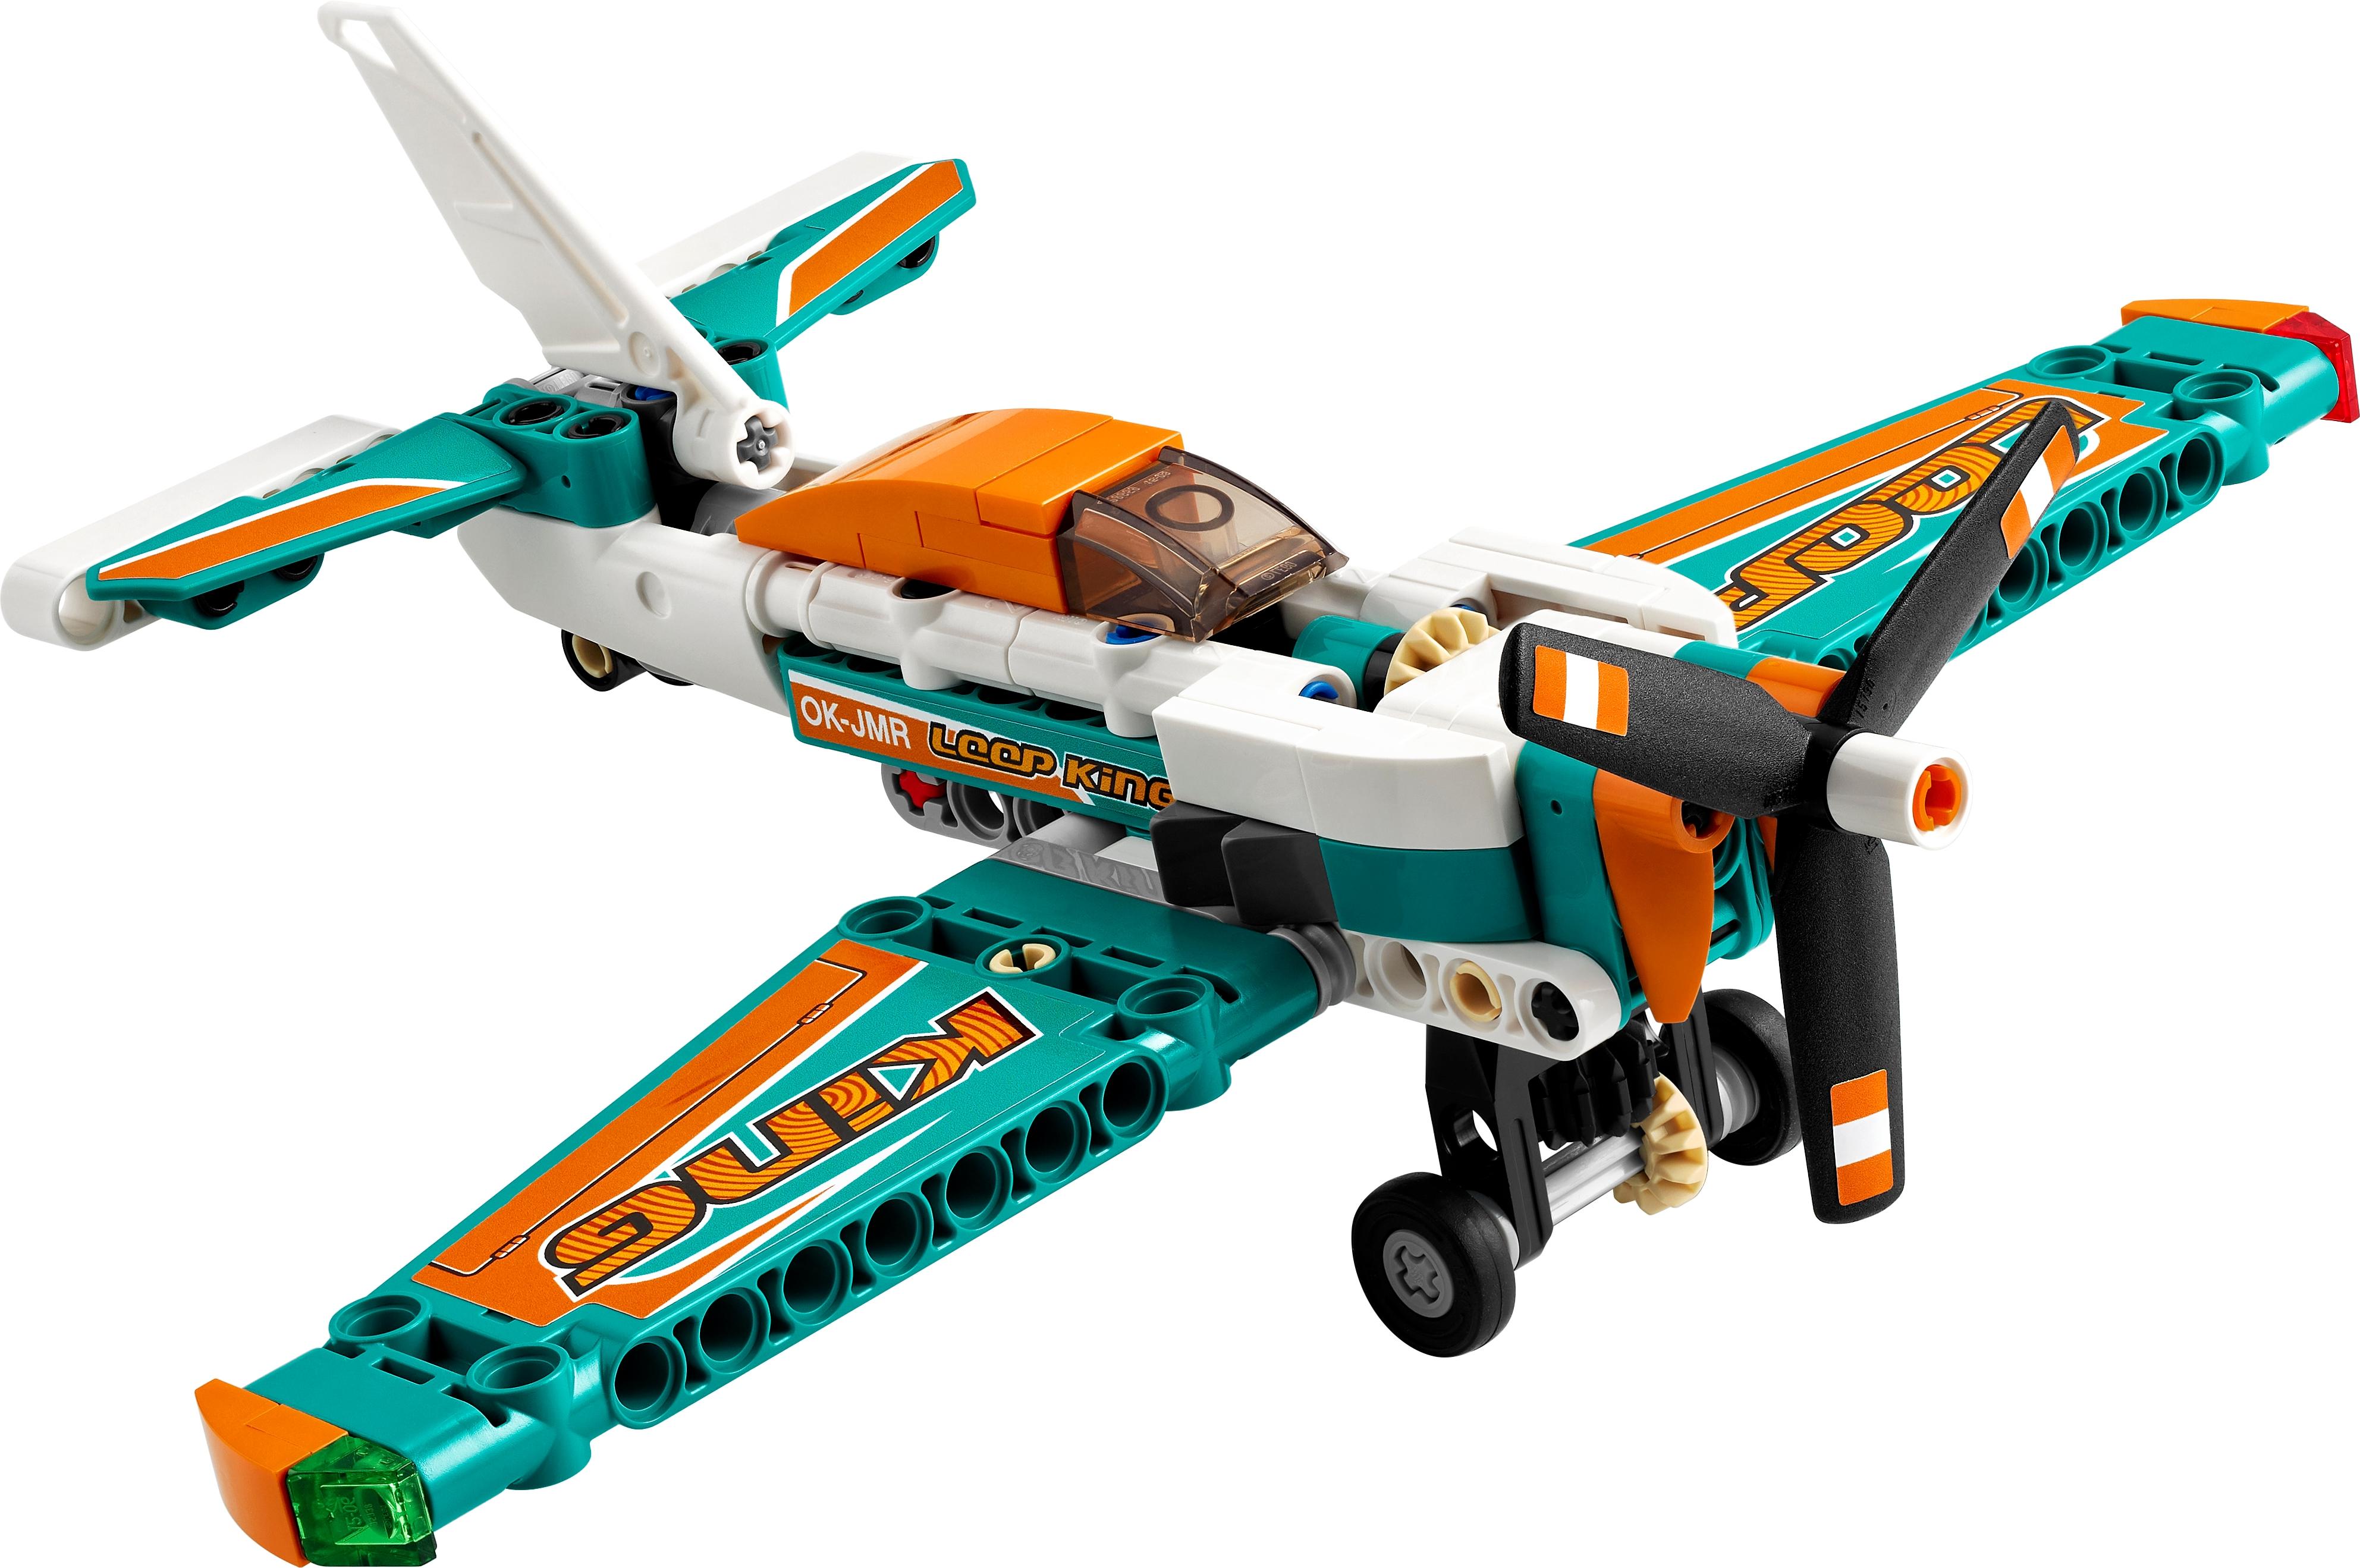 Race Plane